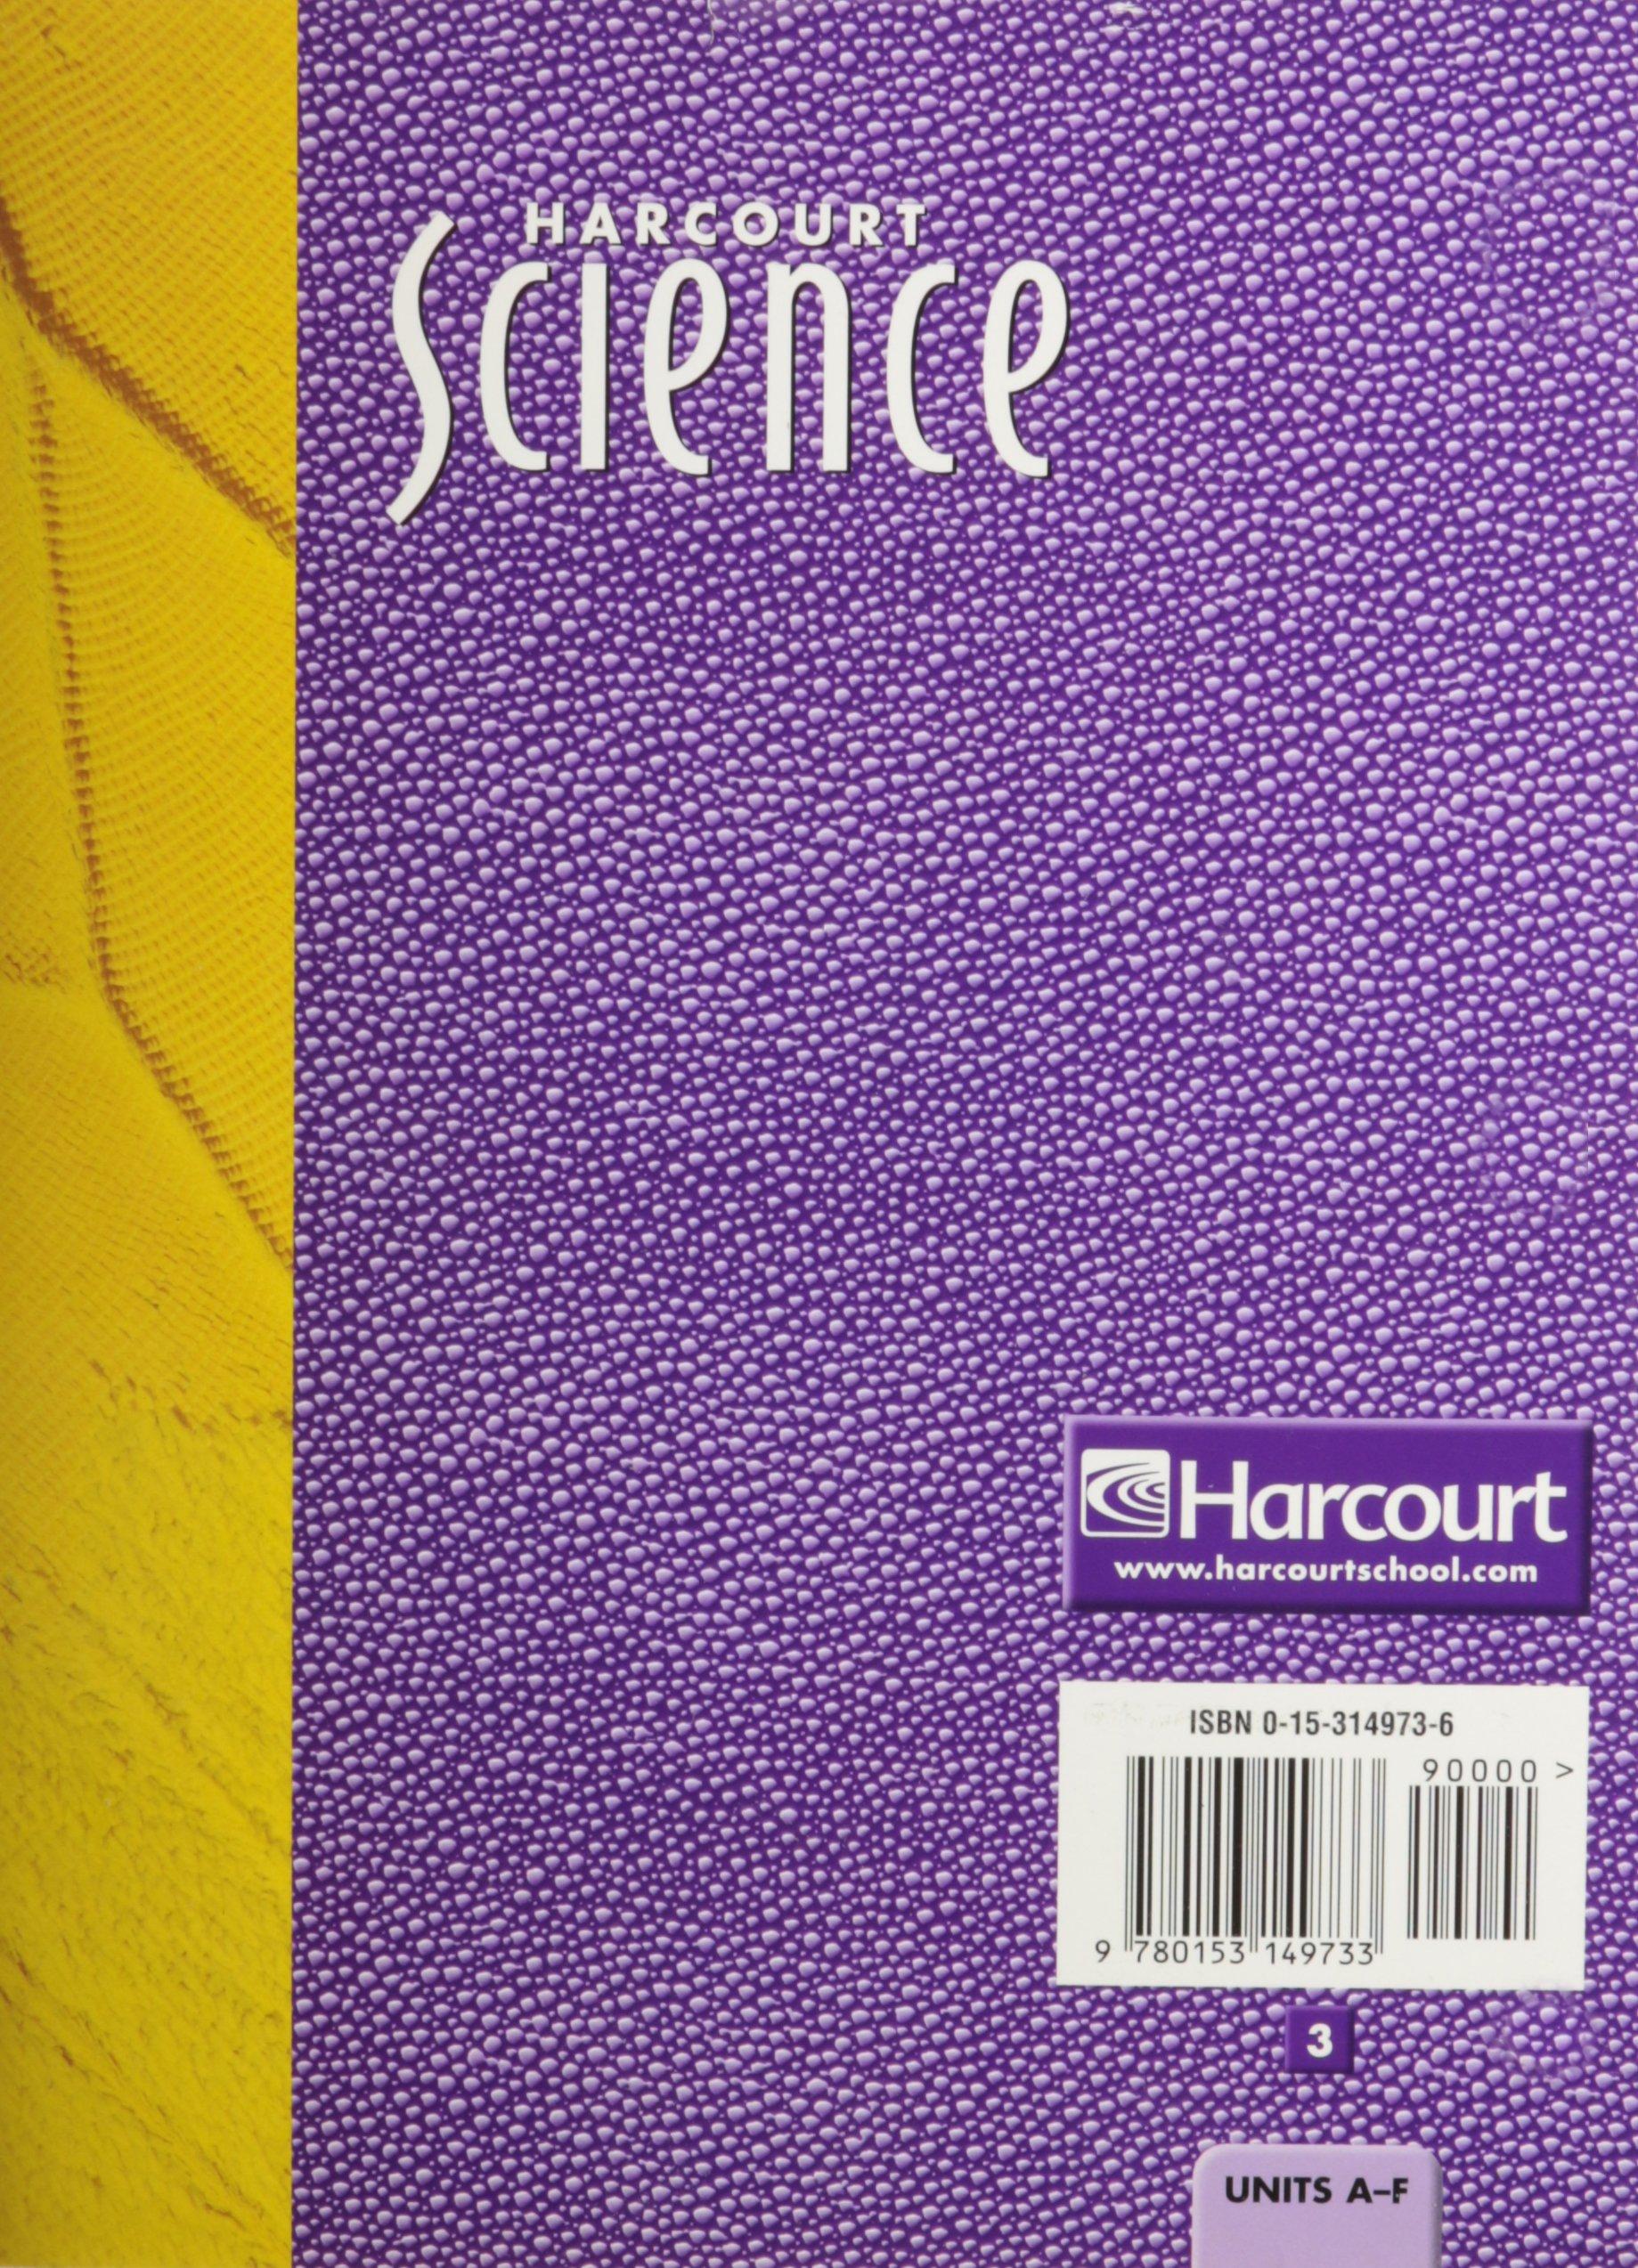 Harcourt Science Workbook, Teacher's Edition, Grade 3, Units A-F: Inc.  Harcourt: 9780153149733: Amazon.com: Books